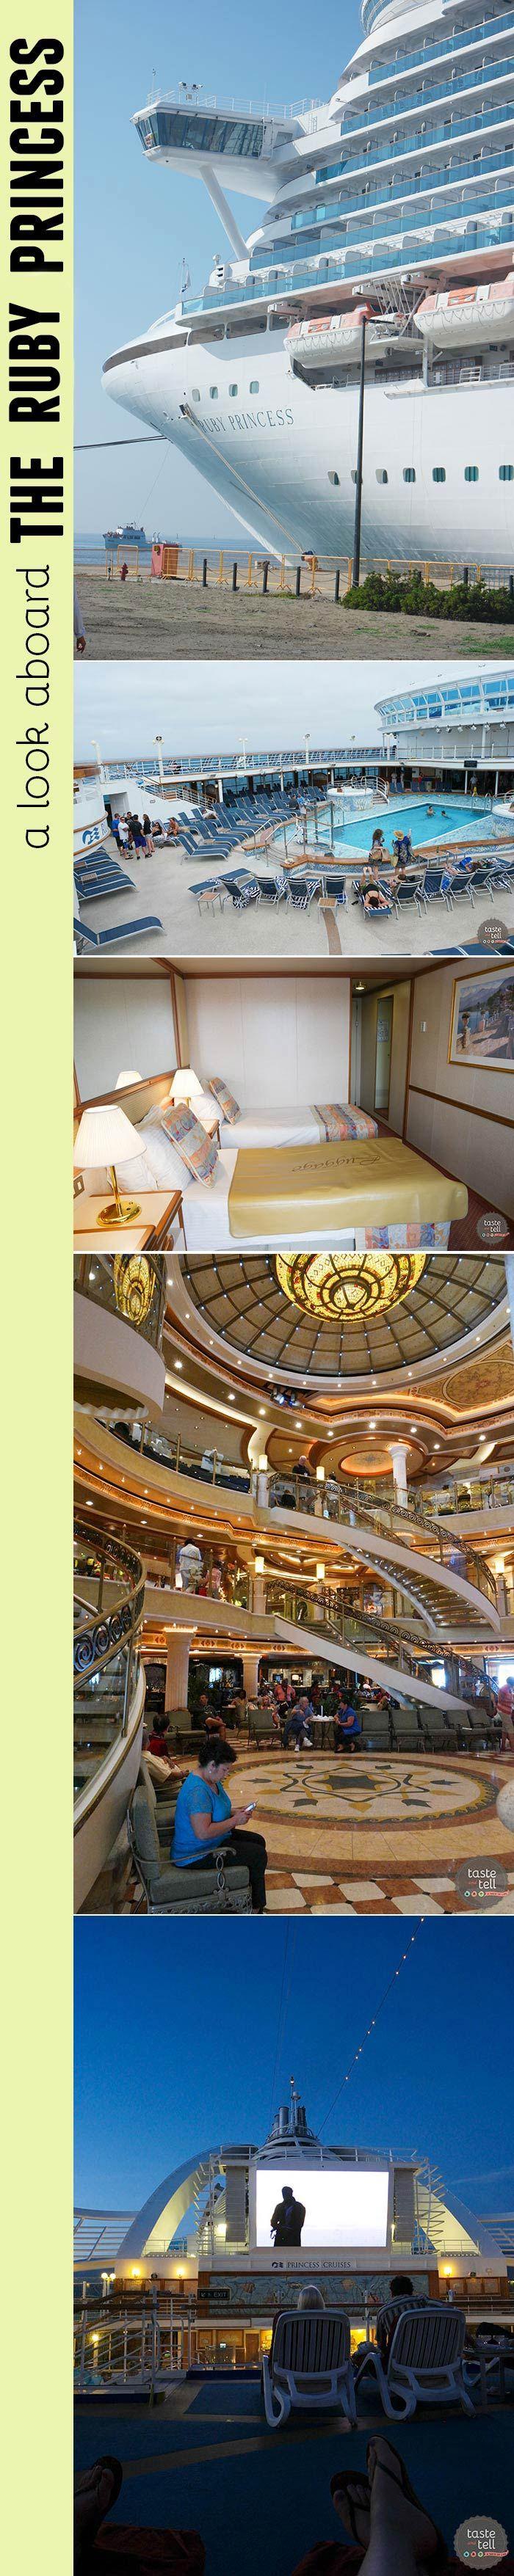 A look at the Ruby Princess – on of the Princess Cruises ships.